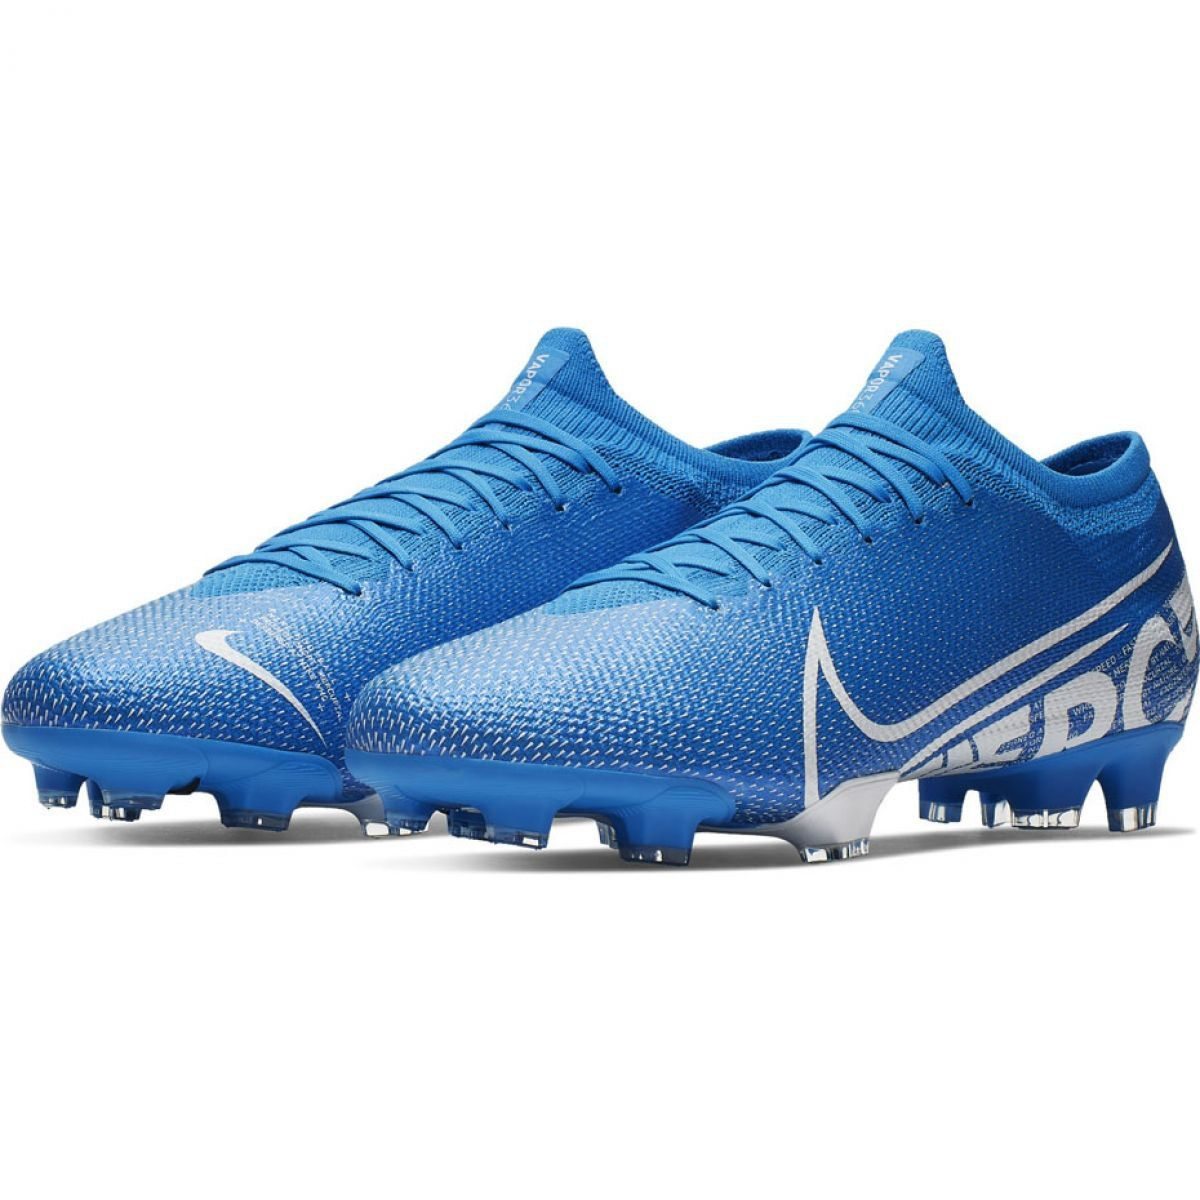 Buty piłkarskie Nike Mercurial Vapor 13 Pro Fg M AT7901 414